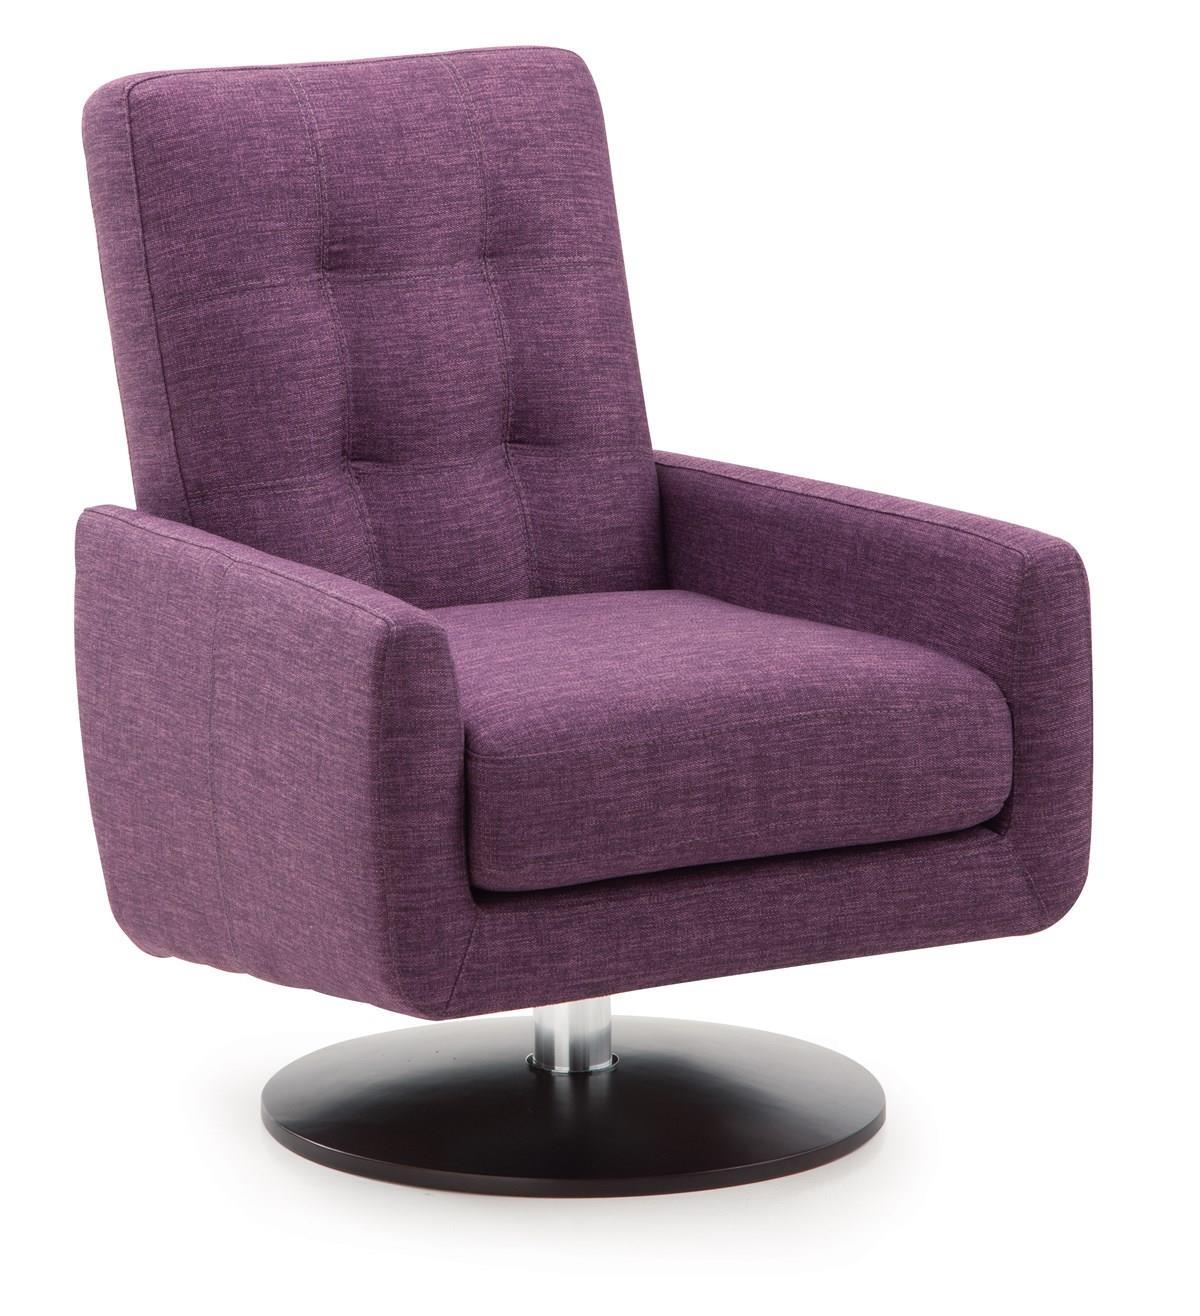 Palliser Halifax Contemporary Swivel Chair